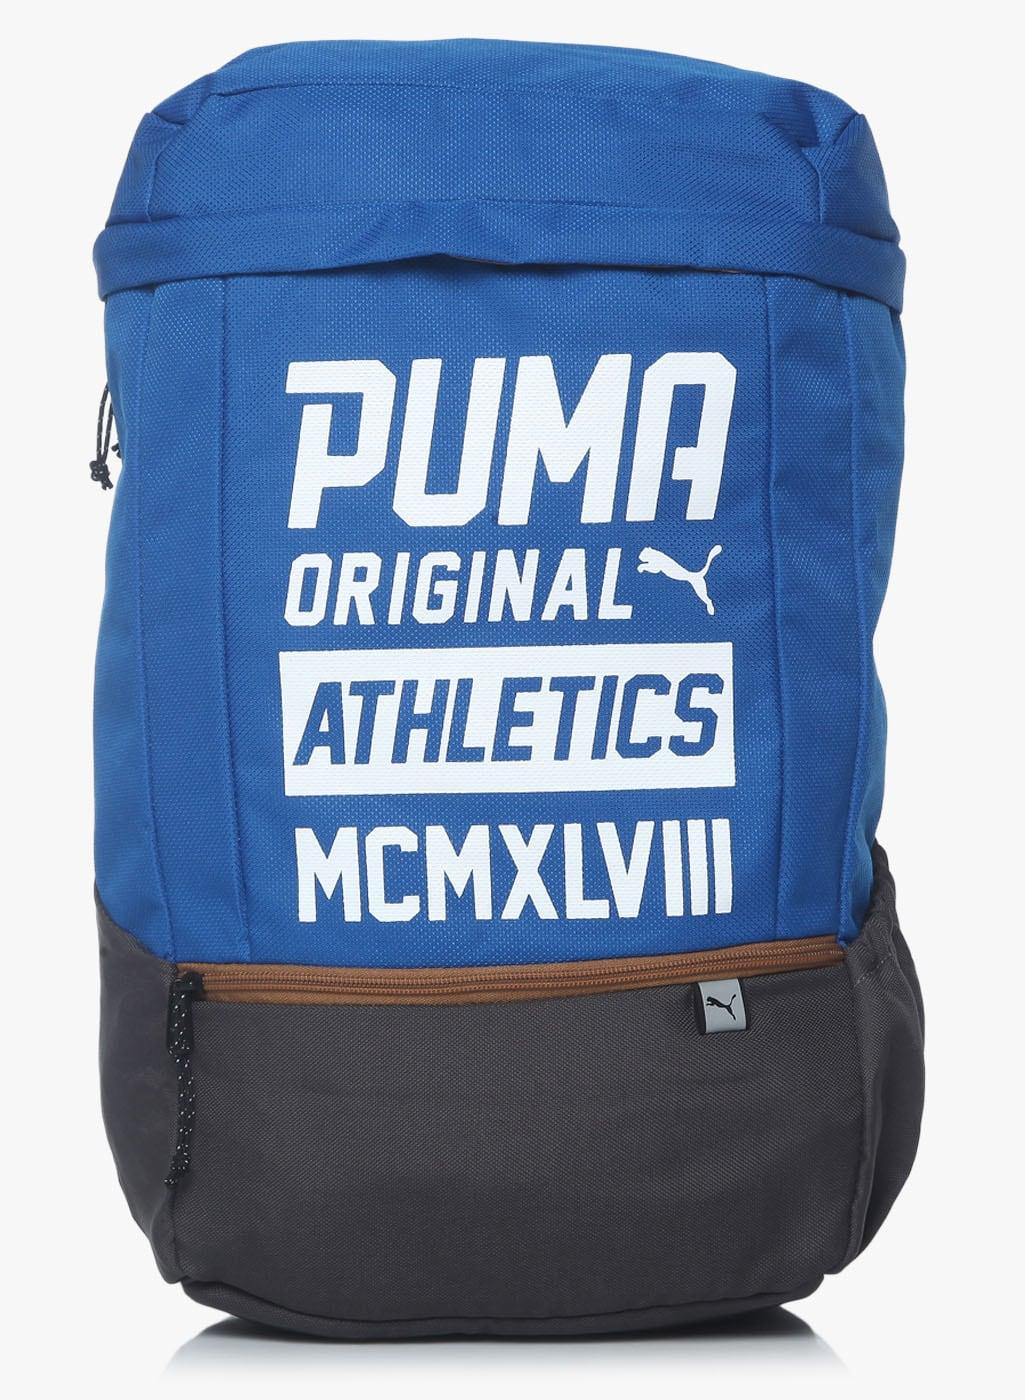 ad1a58d6d9f2 Puma® - Buy Orignal Puma products in India